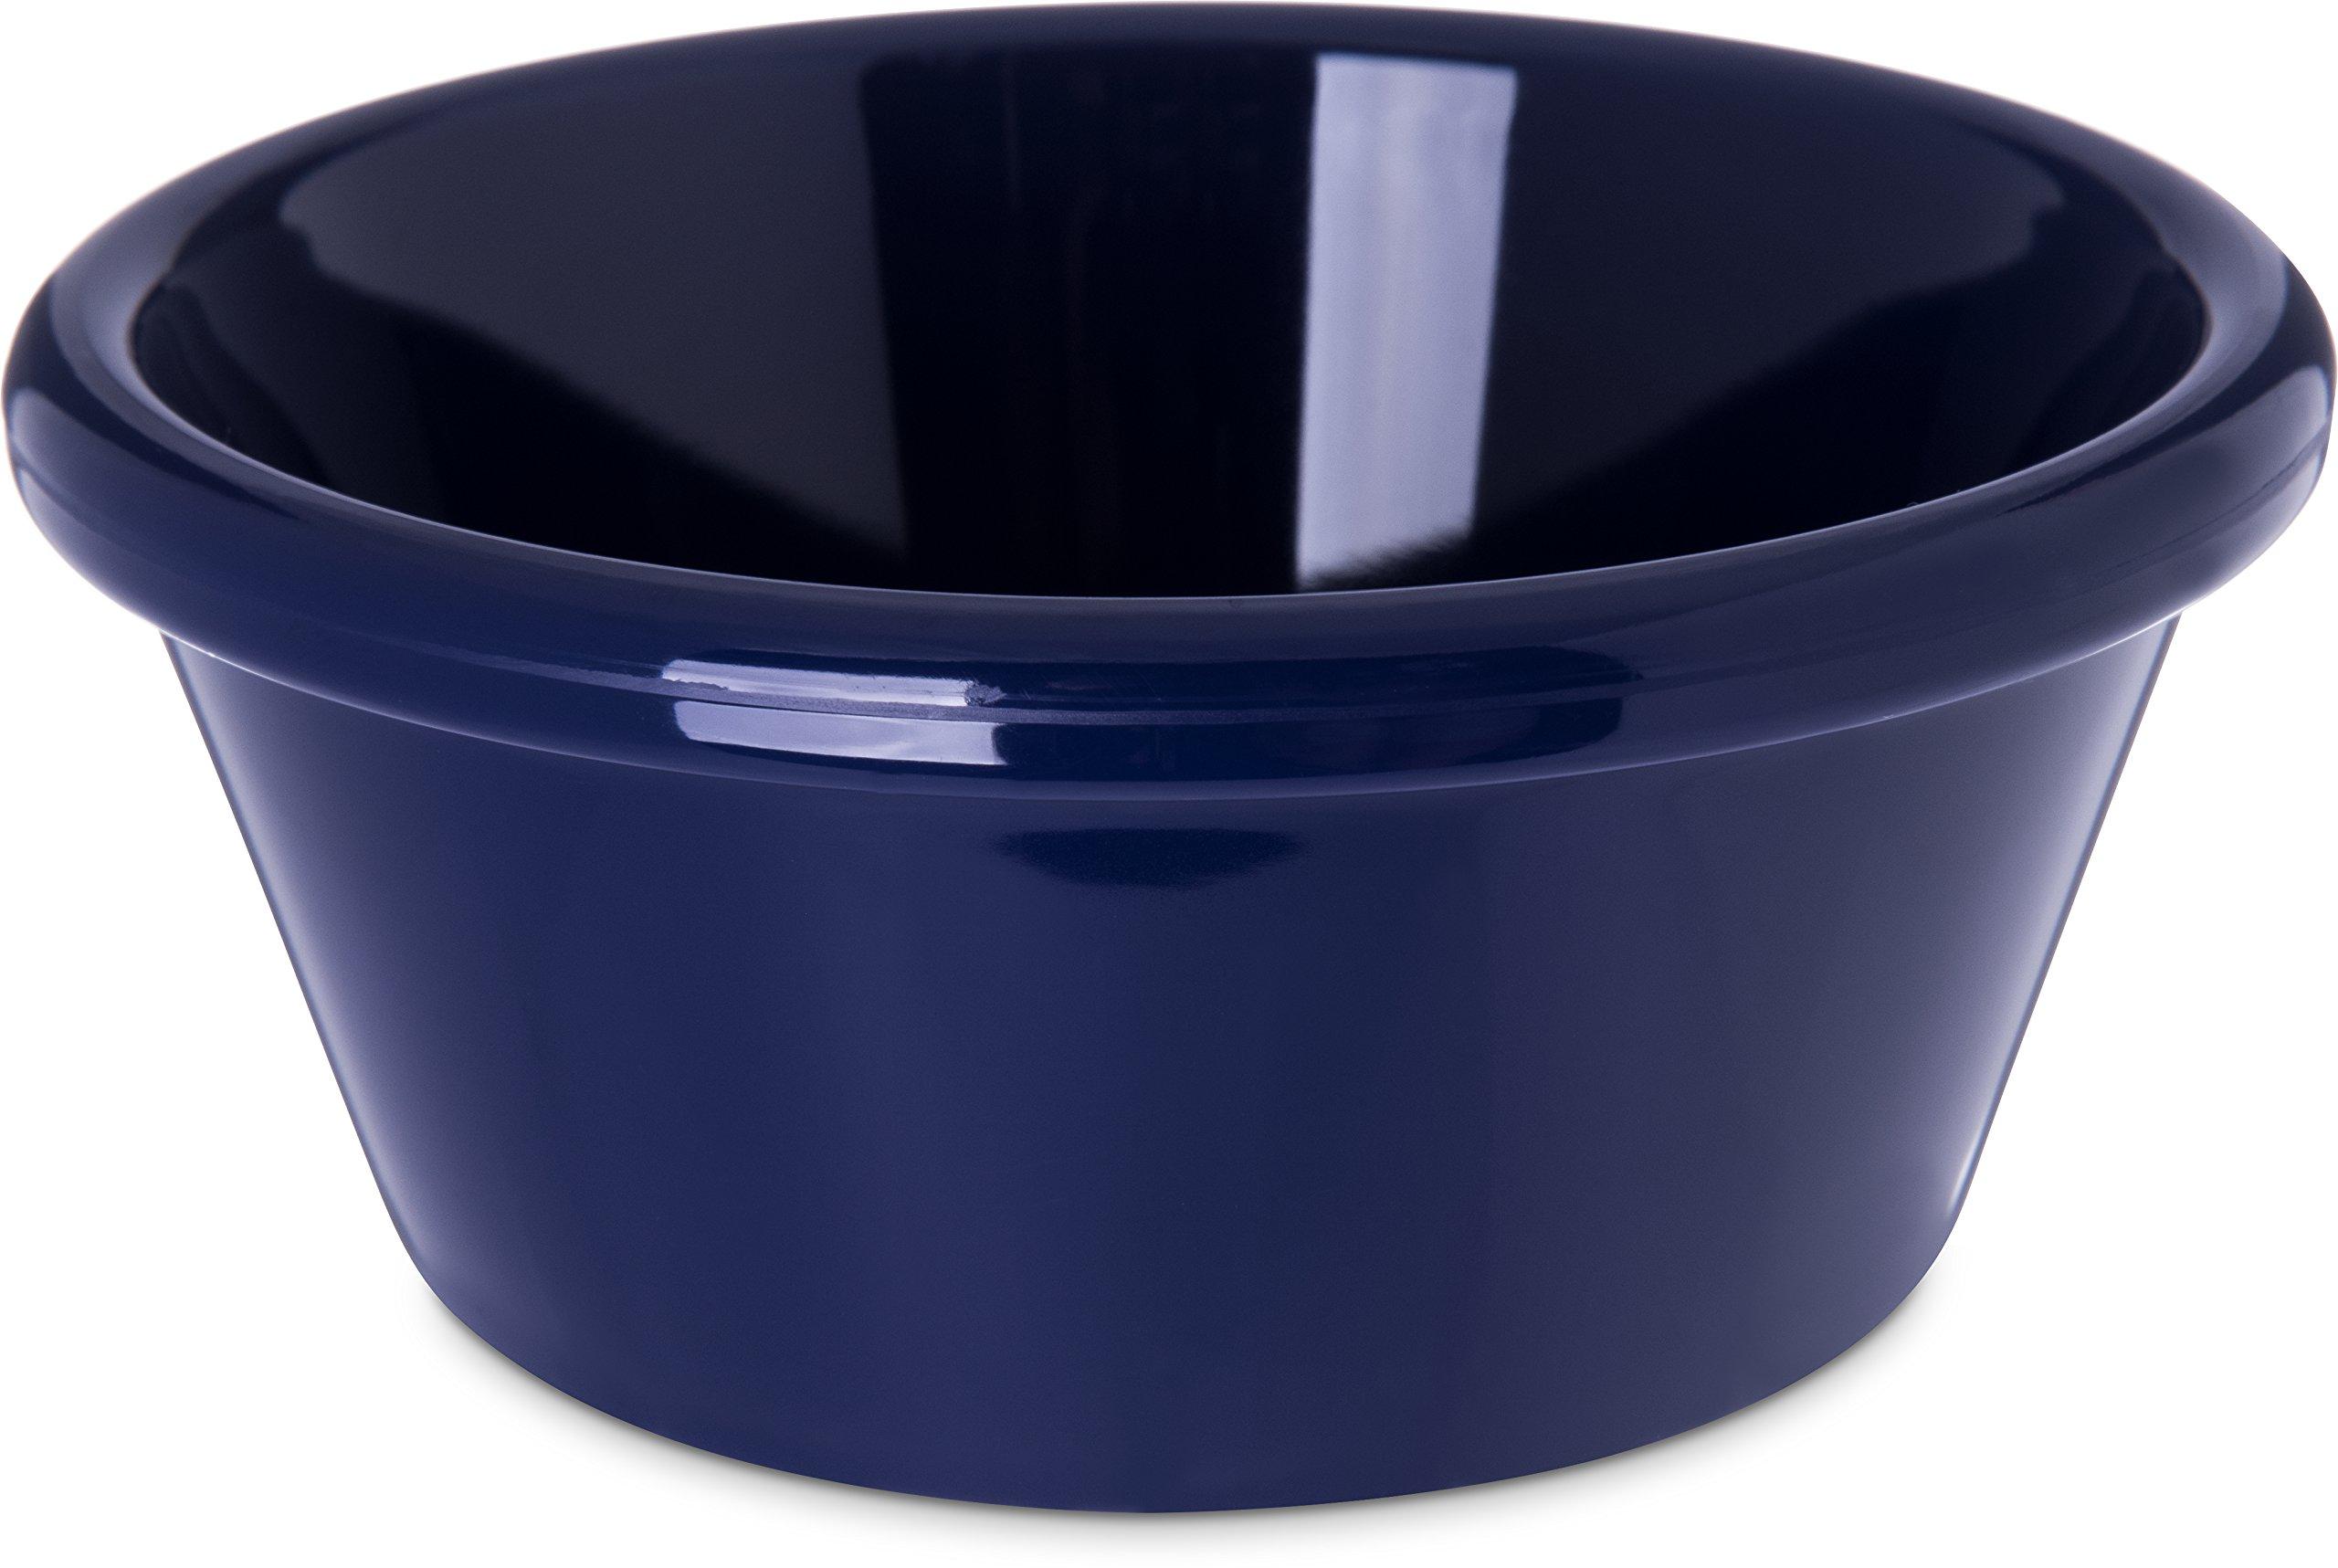 Carlisle 4312660 SAN Smooth Ramekin, 6 oz Capacity, 1.80'' x 3.90'', Cobalt Blue (Case of 48)